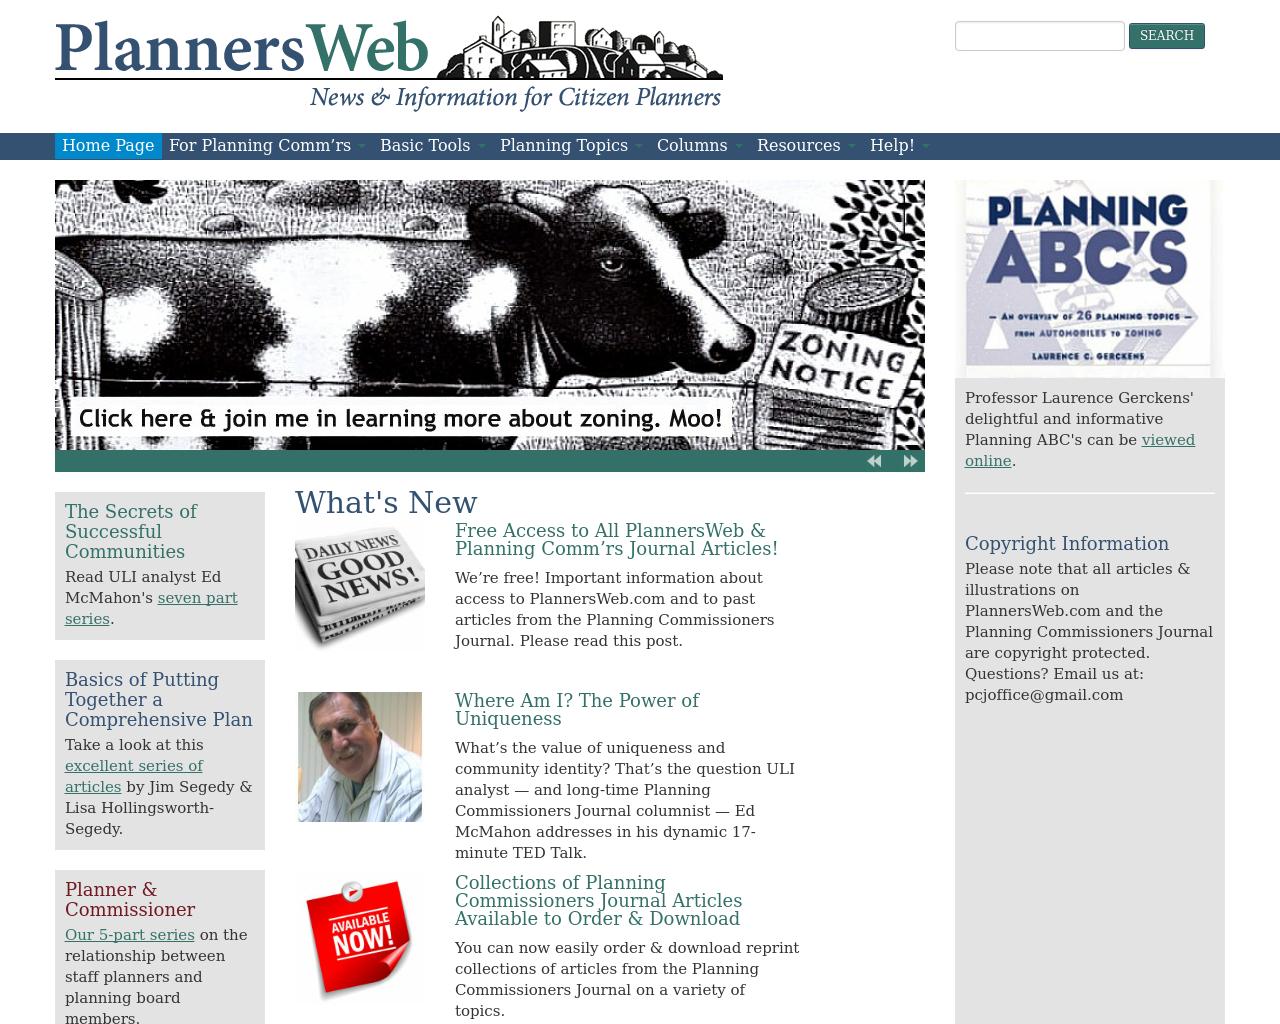 PlannersWeb-Advertising-Reviews-Pricing